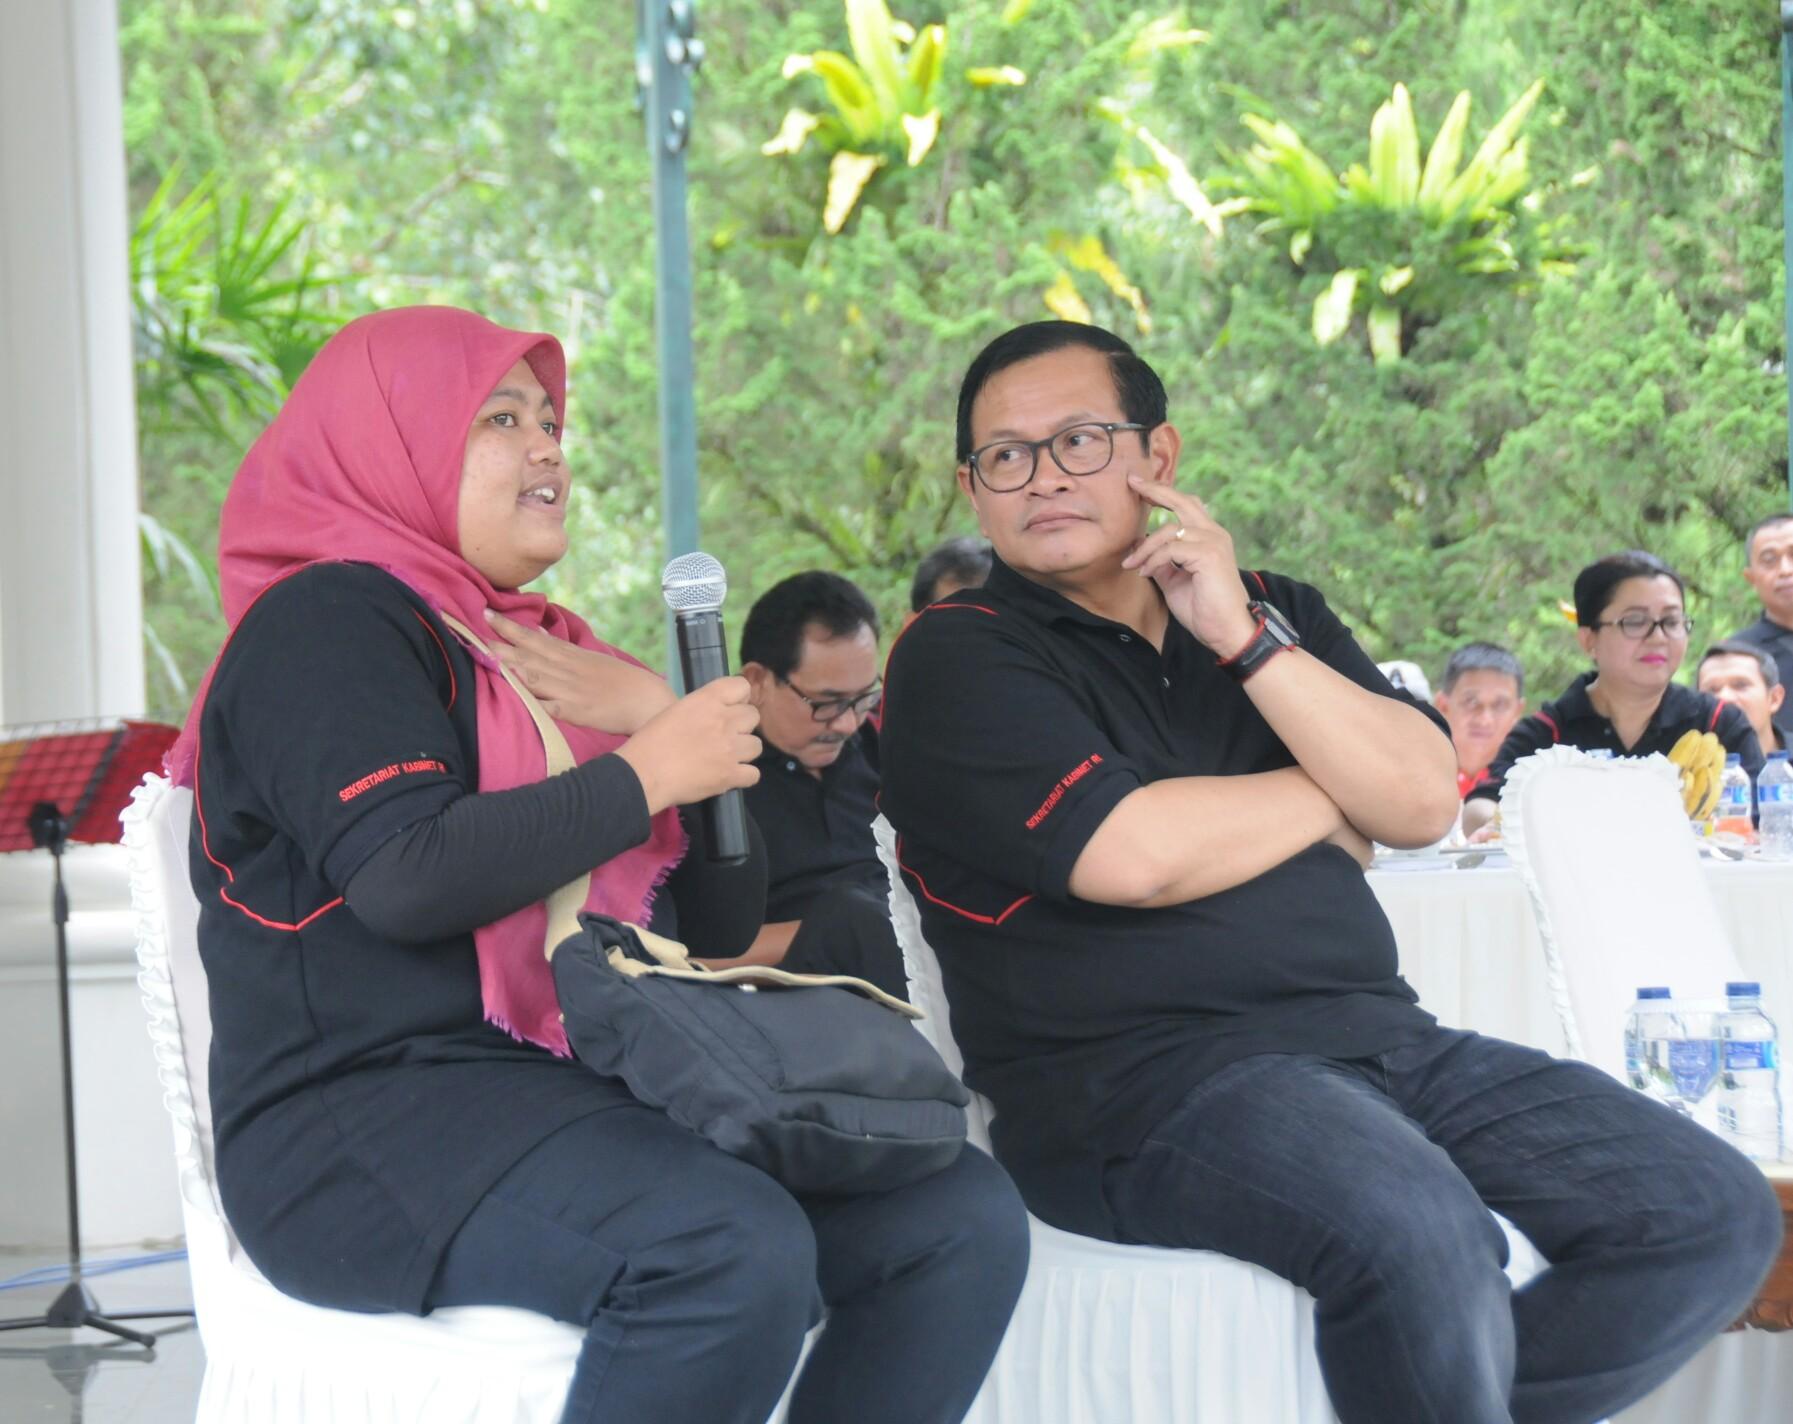 Sesi dialog Seskab bersama pegawai Sekretariat Kabinet dalam Rapat Kerja Setkab di Istana Kepresidenan Cipanas, Jawa Barat, Sabtu (18/2). (Foto: Humas/Deni)